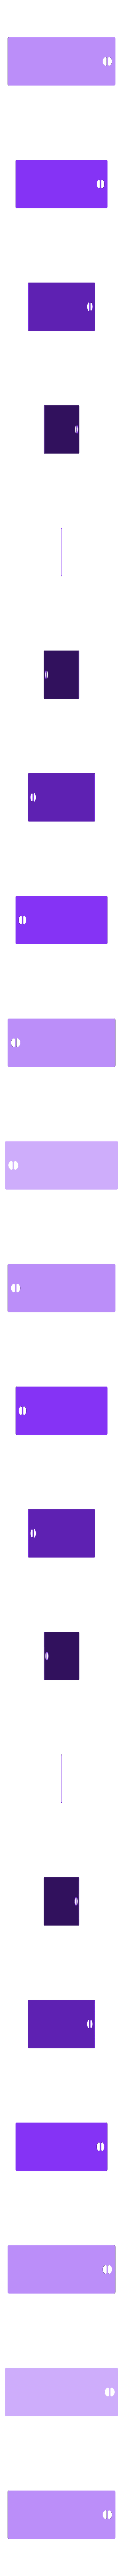 Internal separation.stl Download free STL file cryptex • 3D printable model, MAKINA